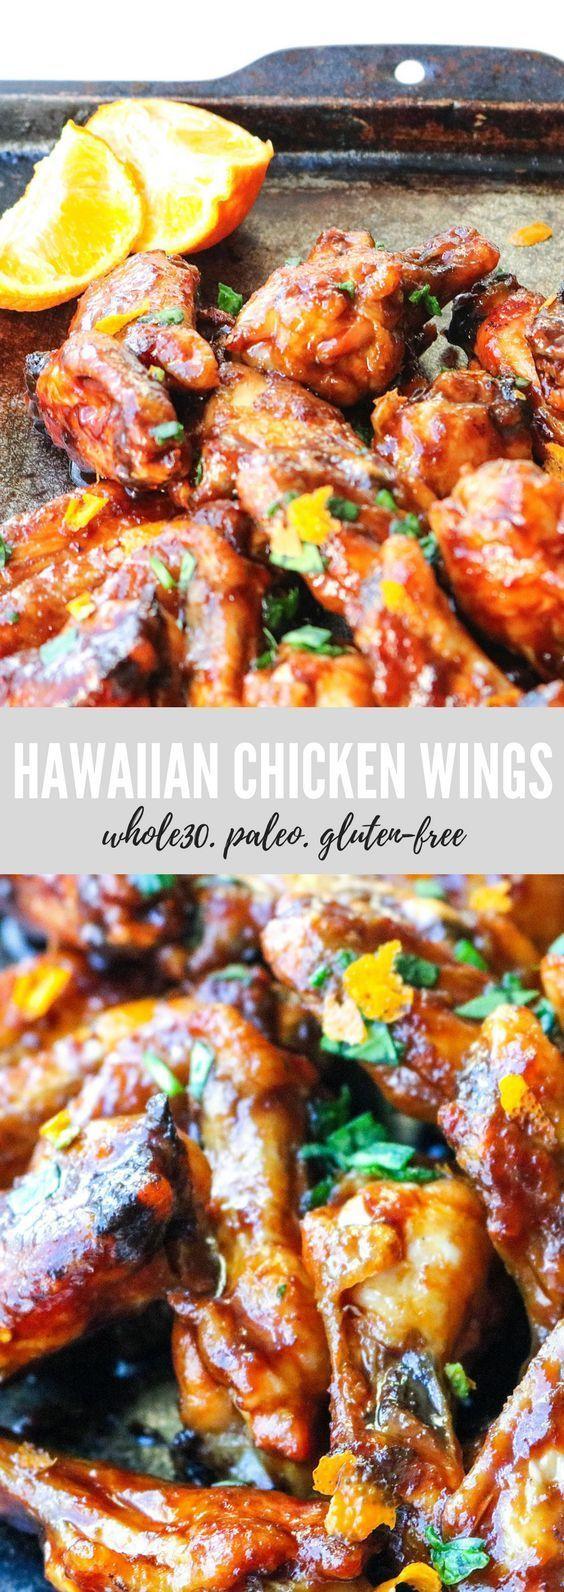 Whole30 Hawaiian Chicken Wings #hawaiianfoodrecipes